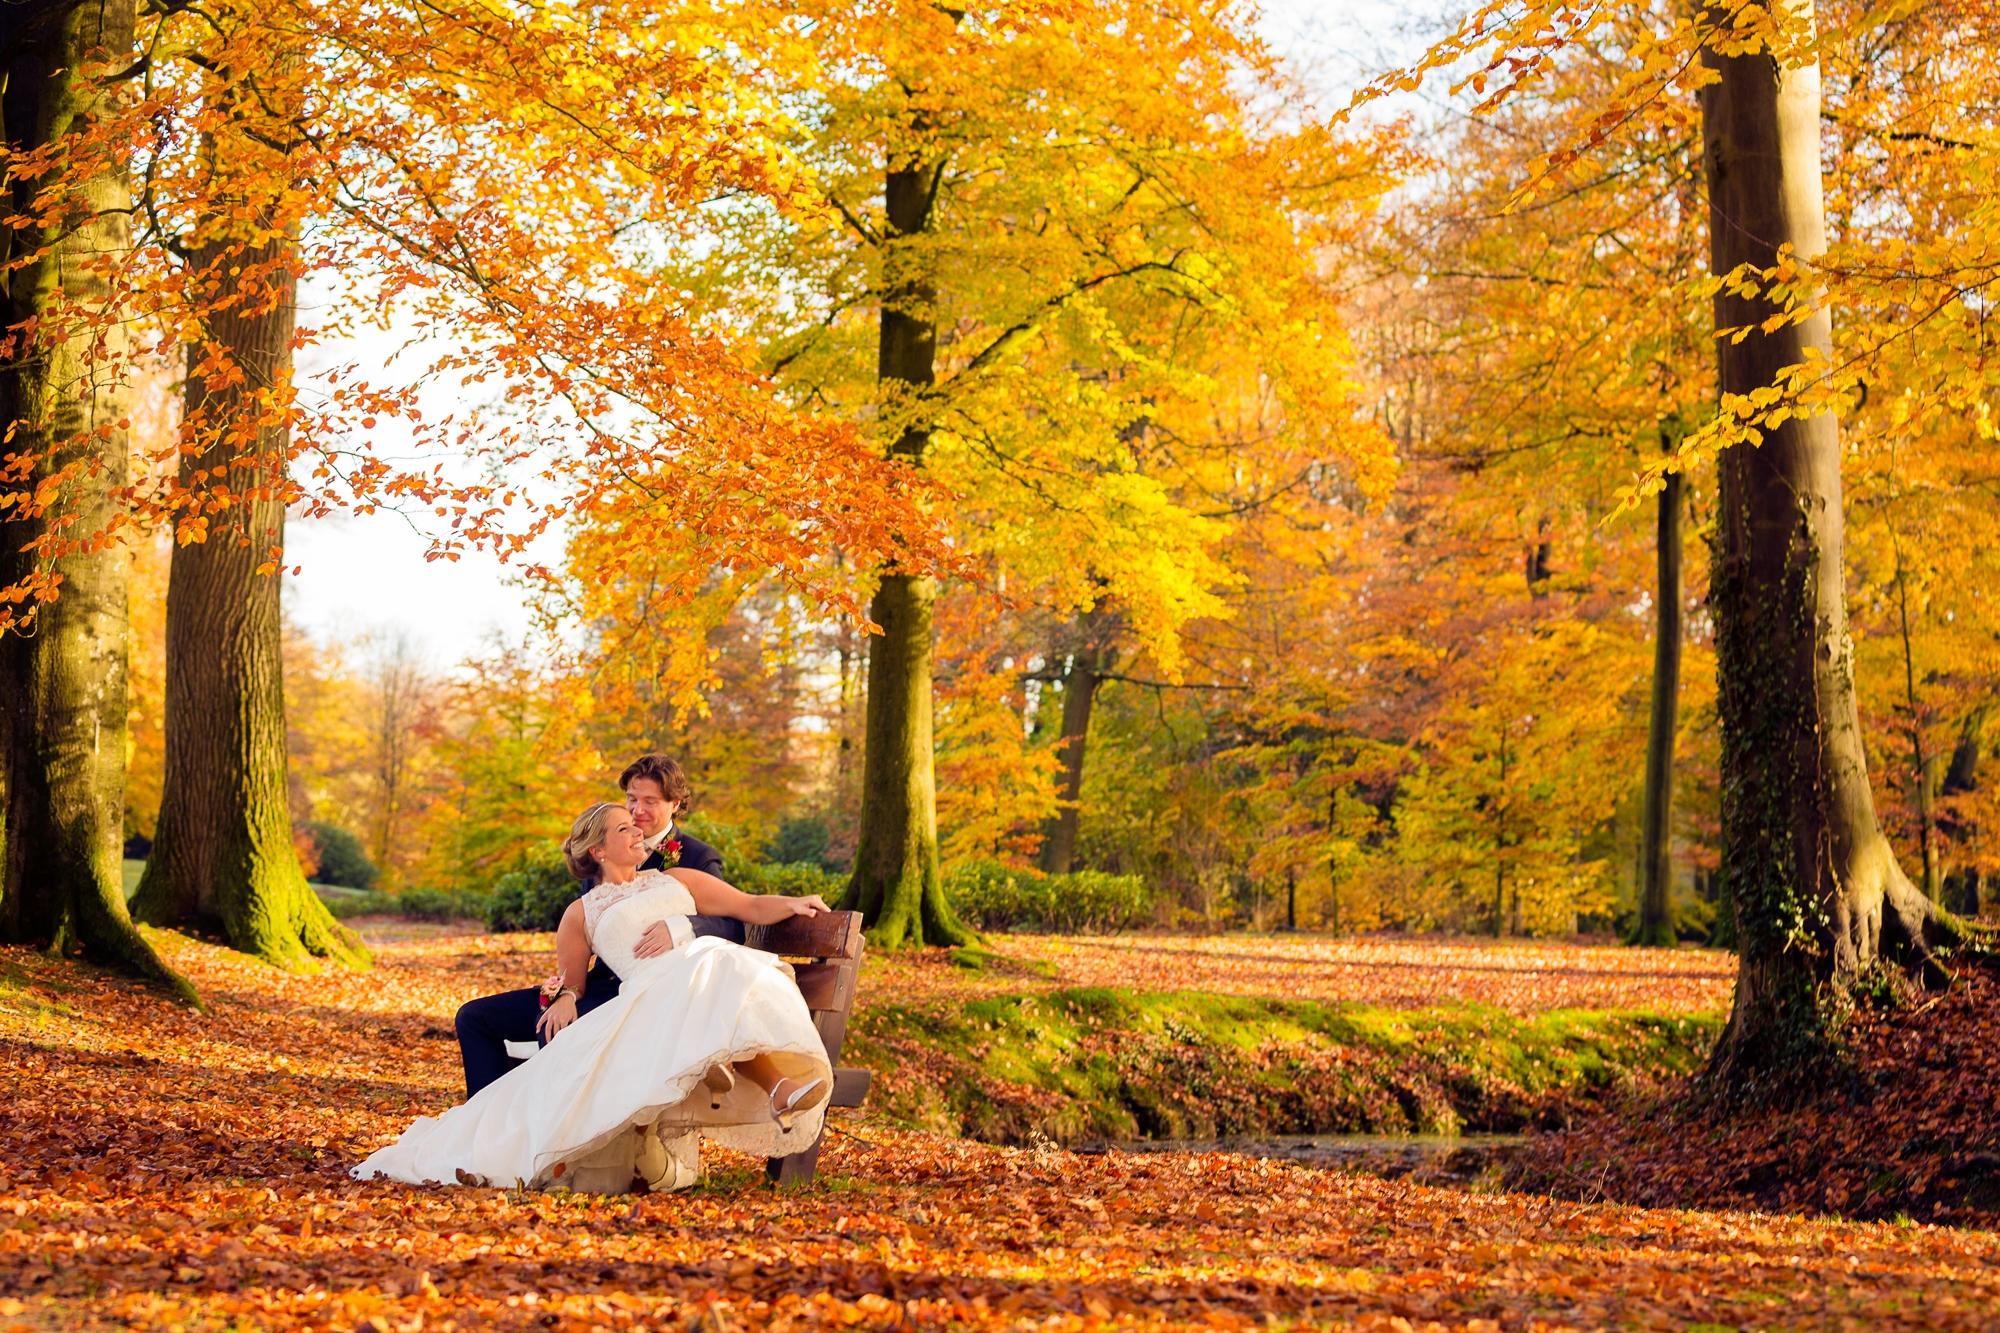 bruidsfotografie-trouwreportage-huwelijksfotografie-bruidsfotograaf-feestfotografie-Ingeborg en Martijn-30.jpg